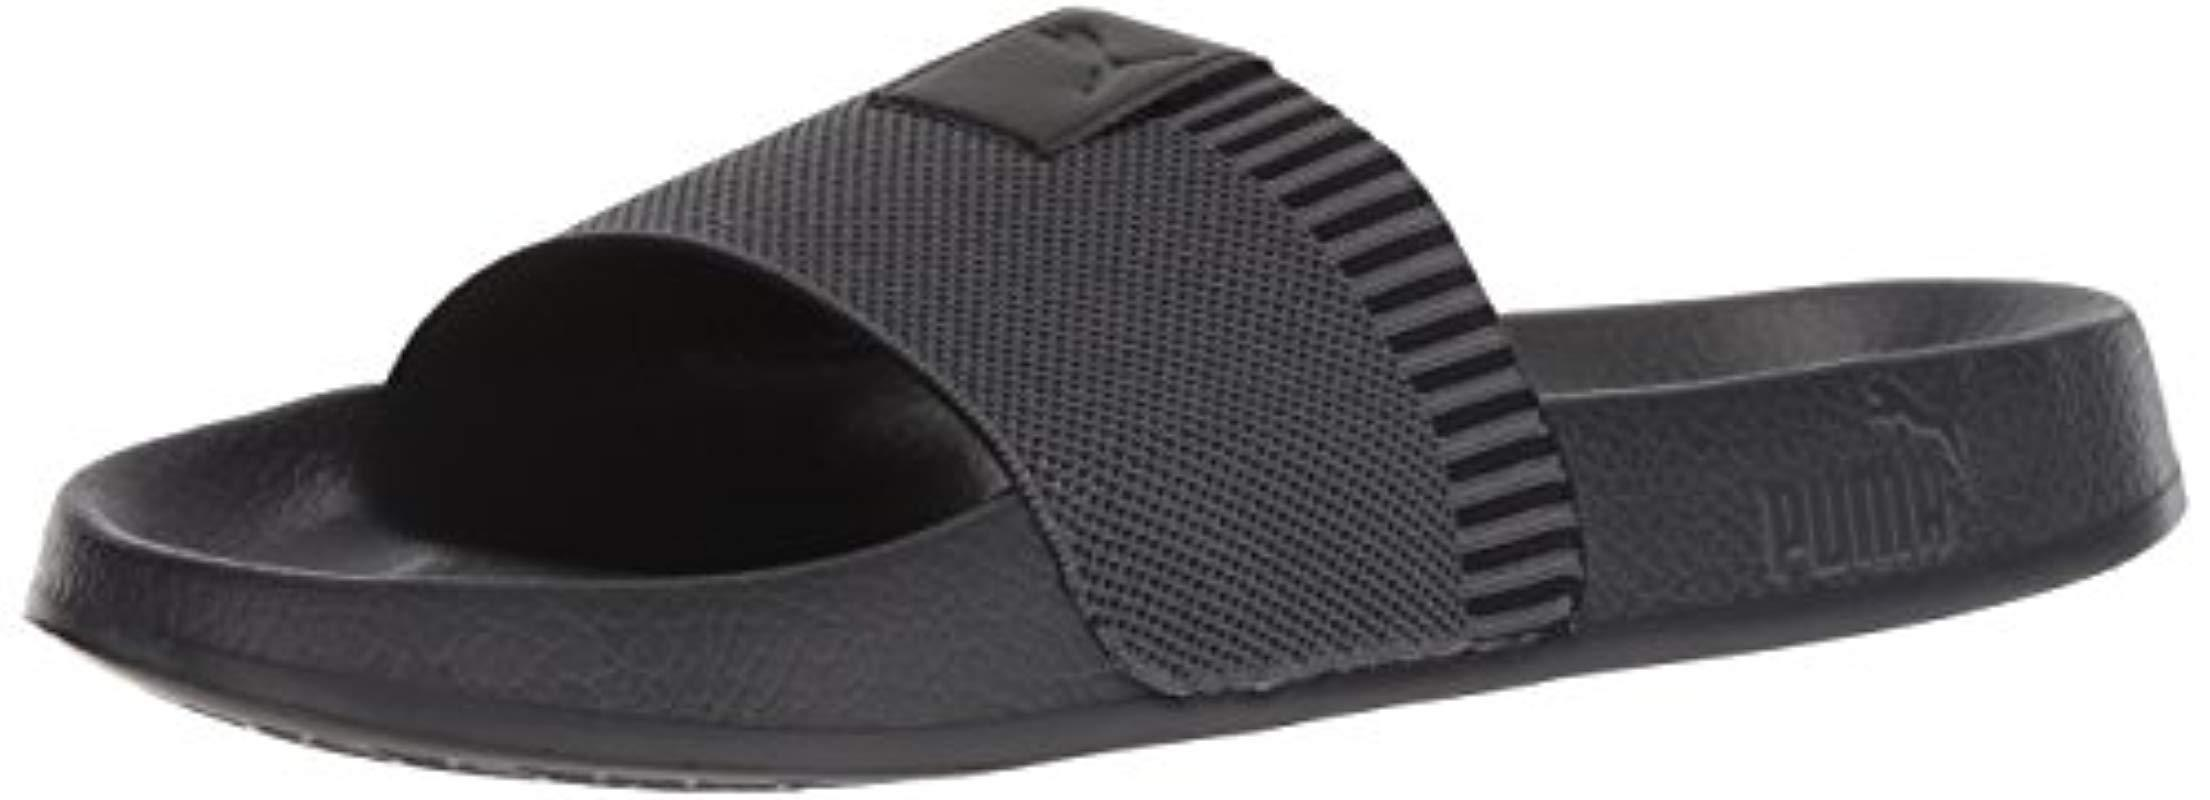 1e3de2c6c0c3b Lyst - PUMA Leadcat Knit Slide Sandal in Black for Men